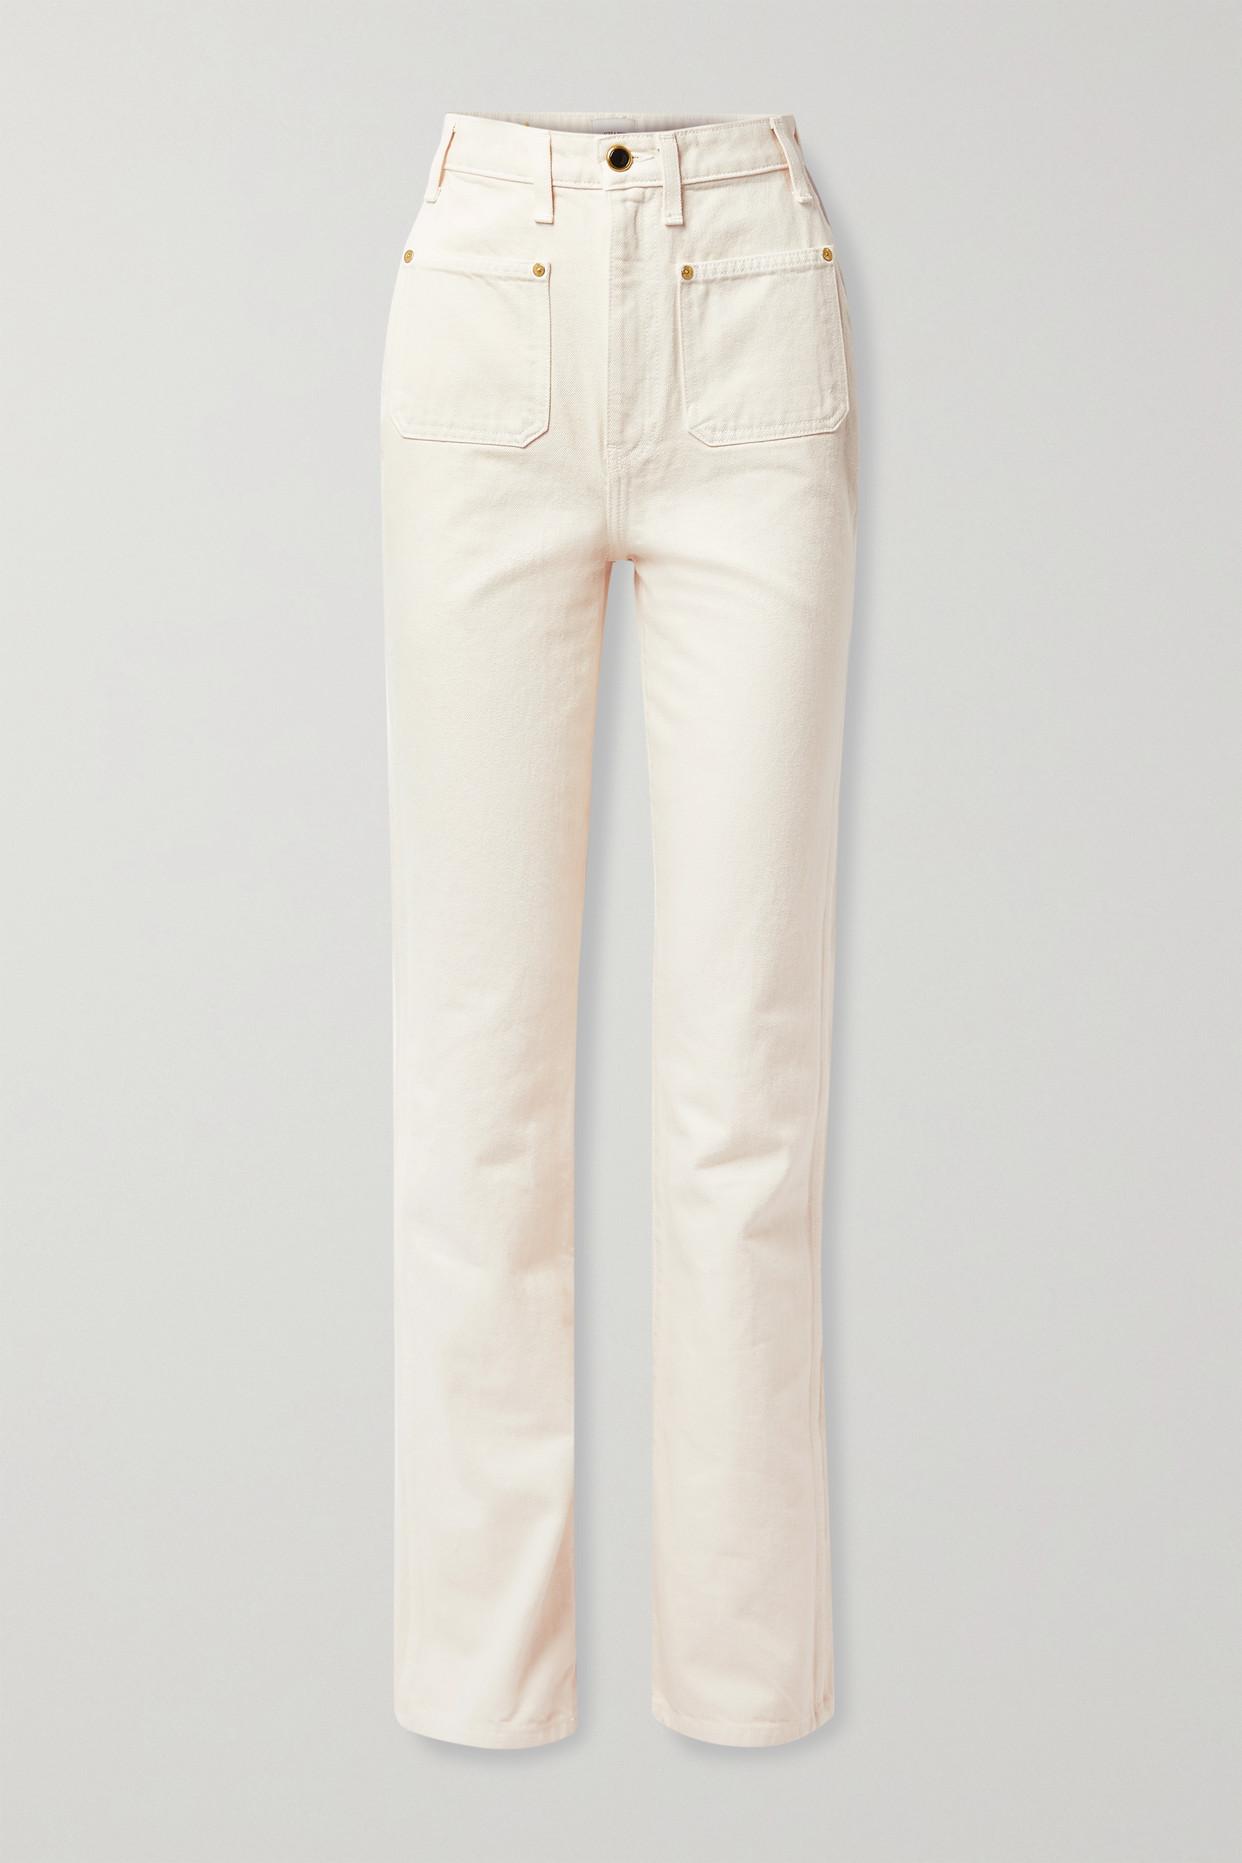 KHAITE - Isabella High-rise Straight-leg Jeans - Ivory - 29